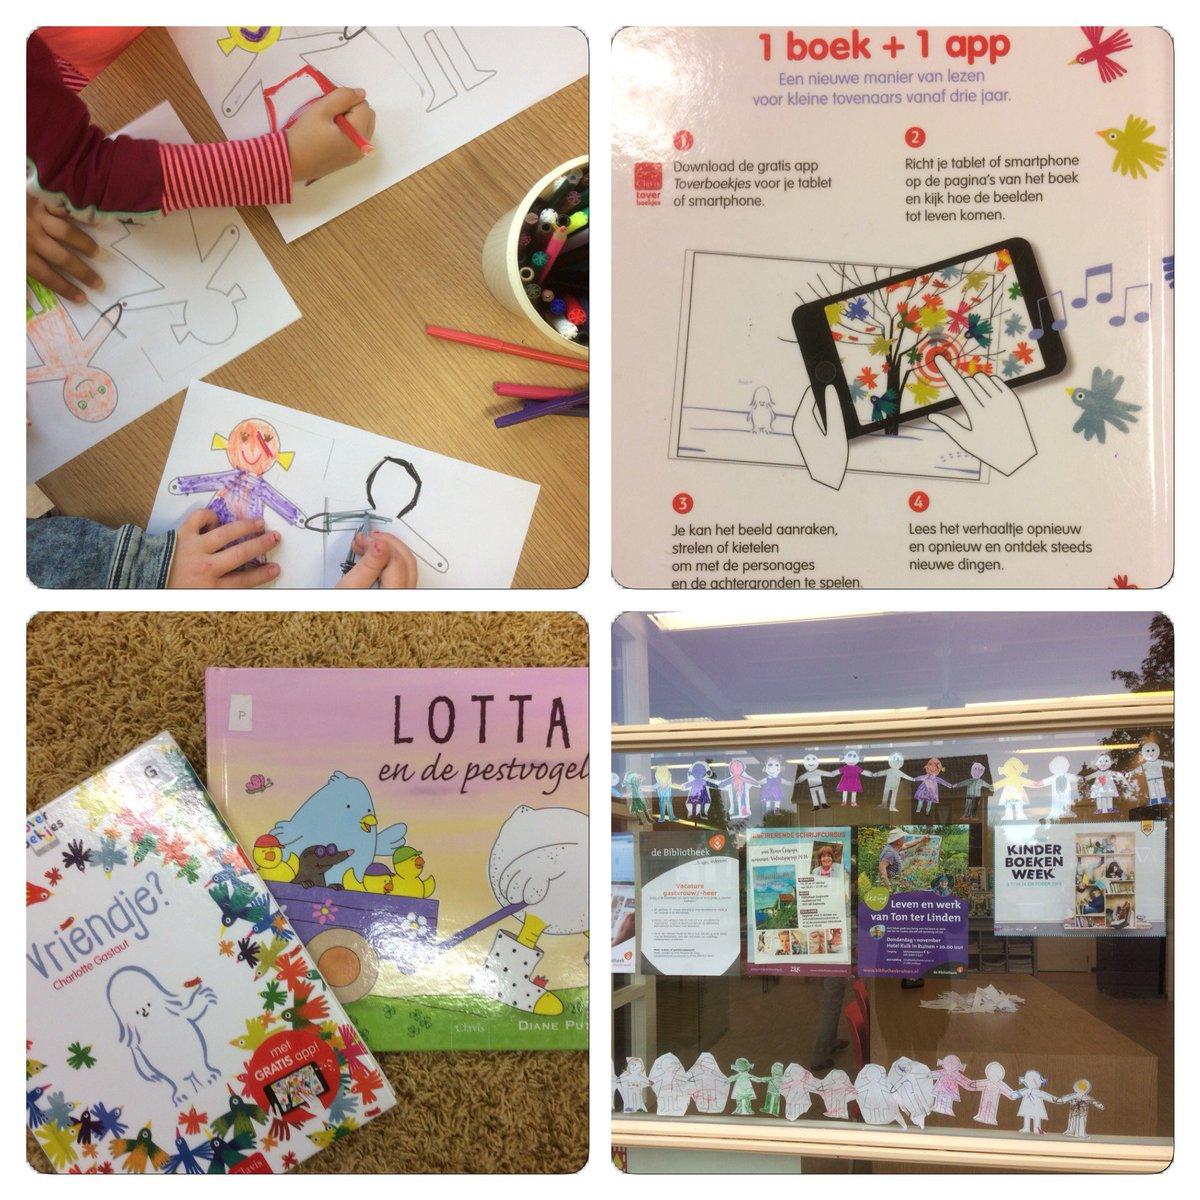 test Twitter Media - In bibliotheek Ruinerwold was het donderdag ook feest! @KBweek #kinderboekenweek https://t.co/XylZxCKIu1